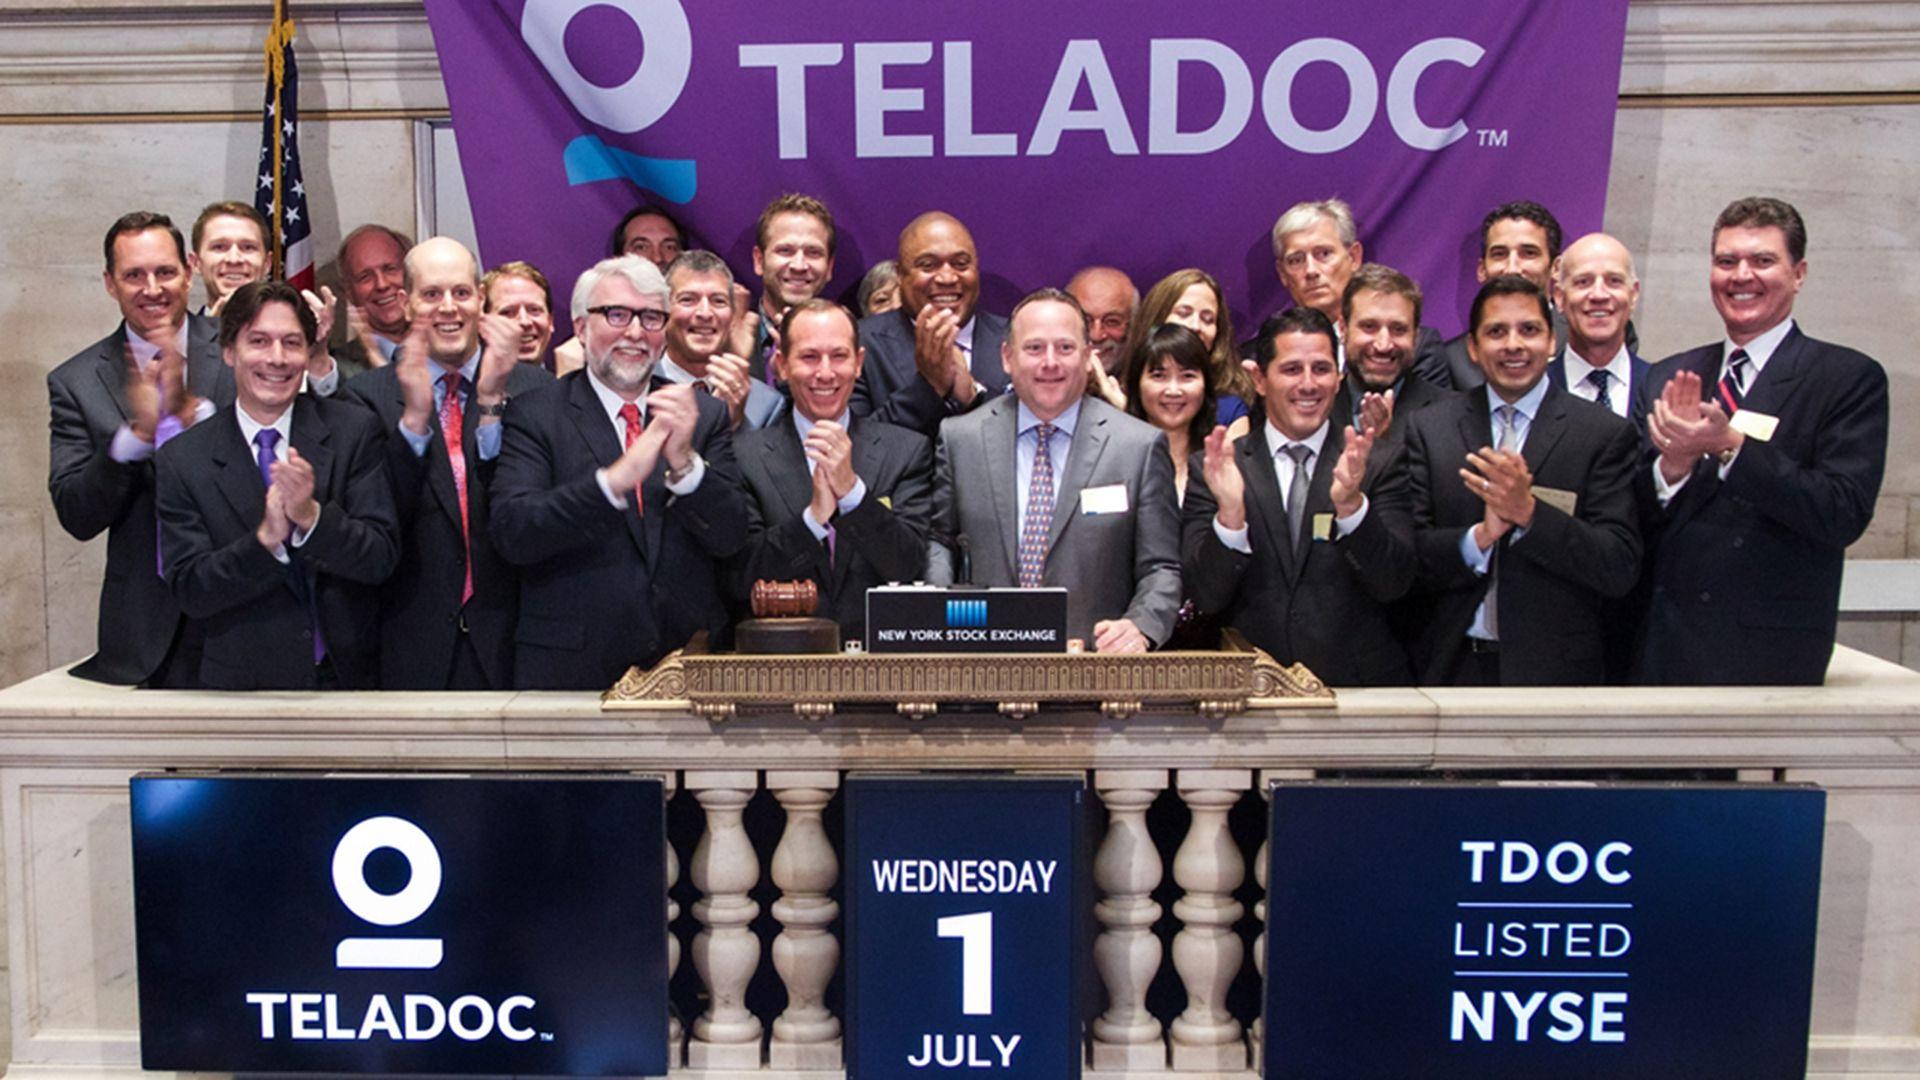 Teladoc executives at the New York Stock Exchange.